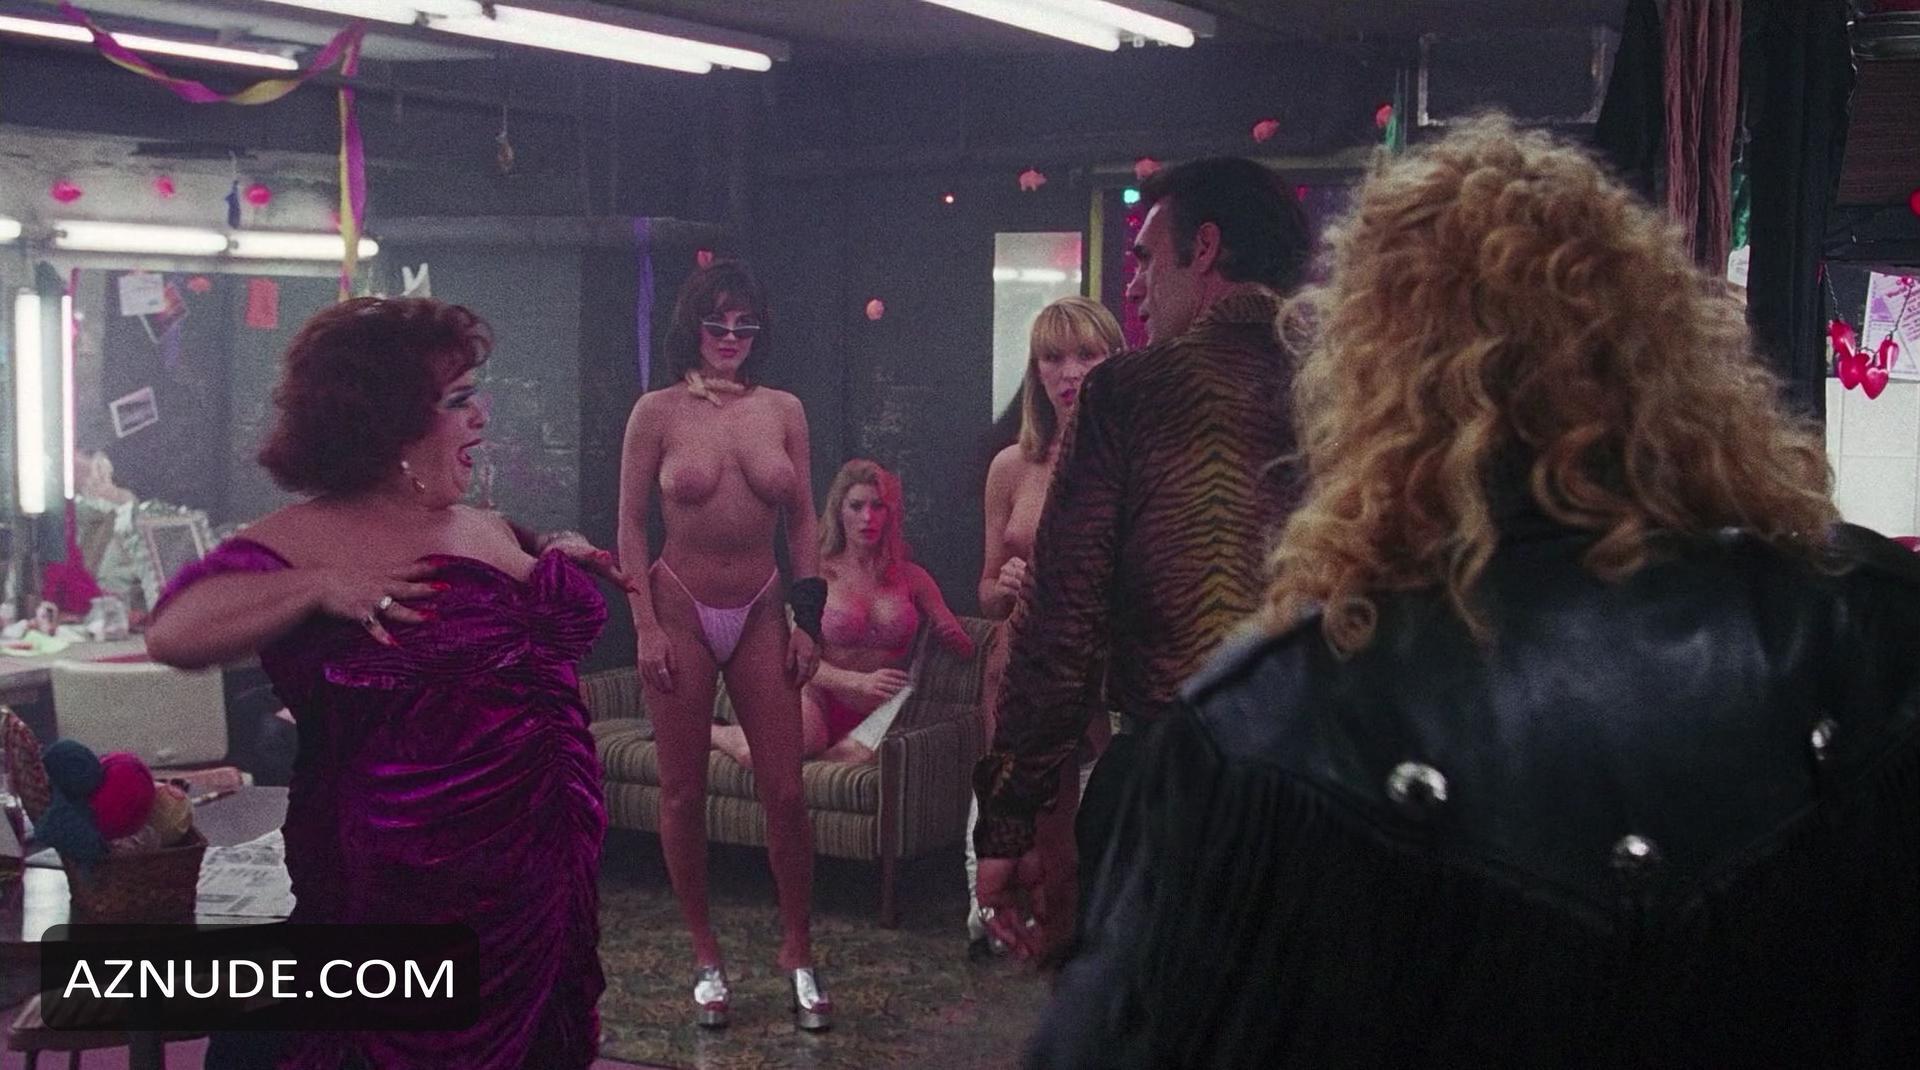 Naked bobbie phillips in cheyenne ancensored